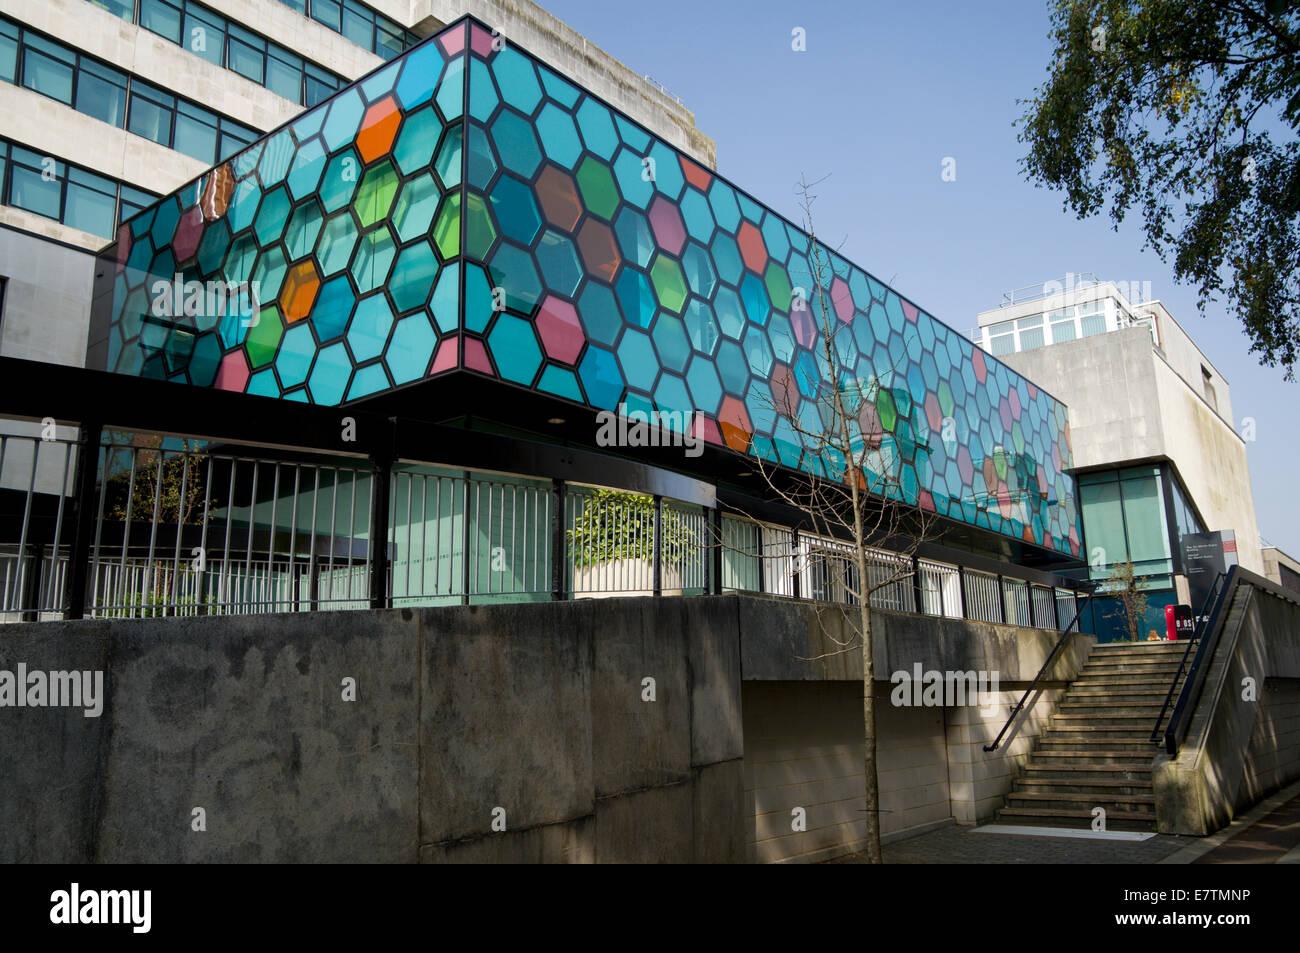 Cardiff University Sir Martin Evans Building